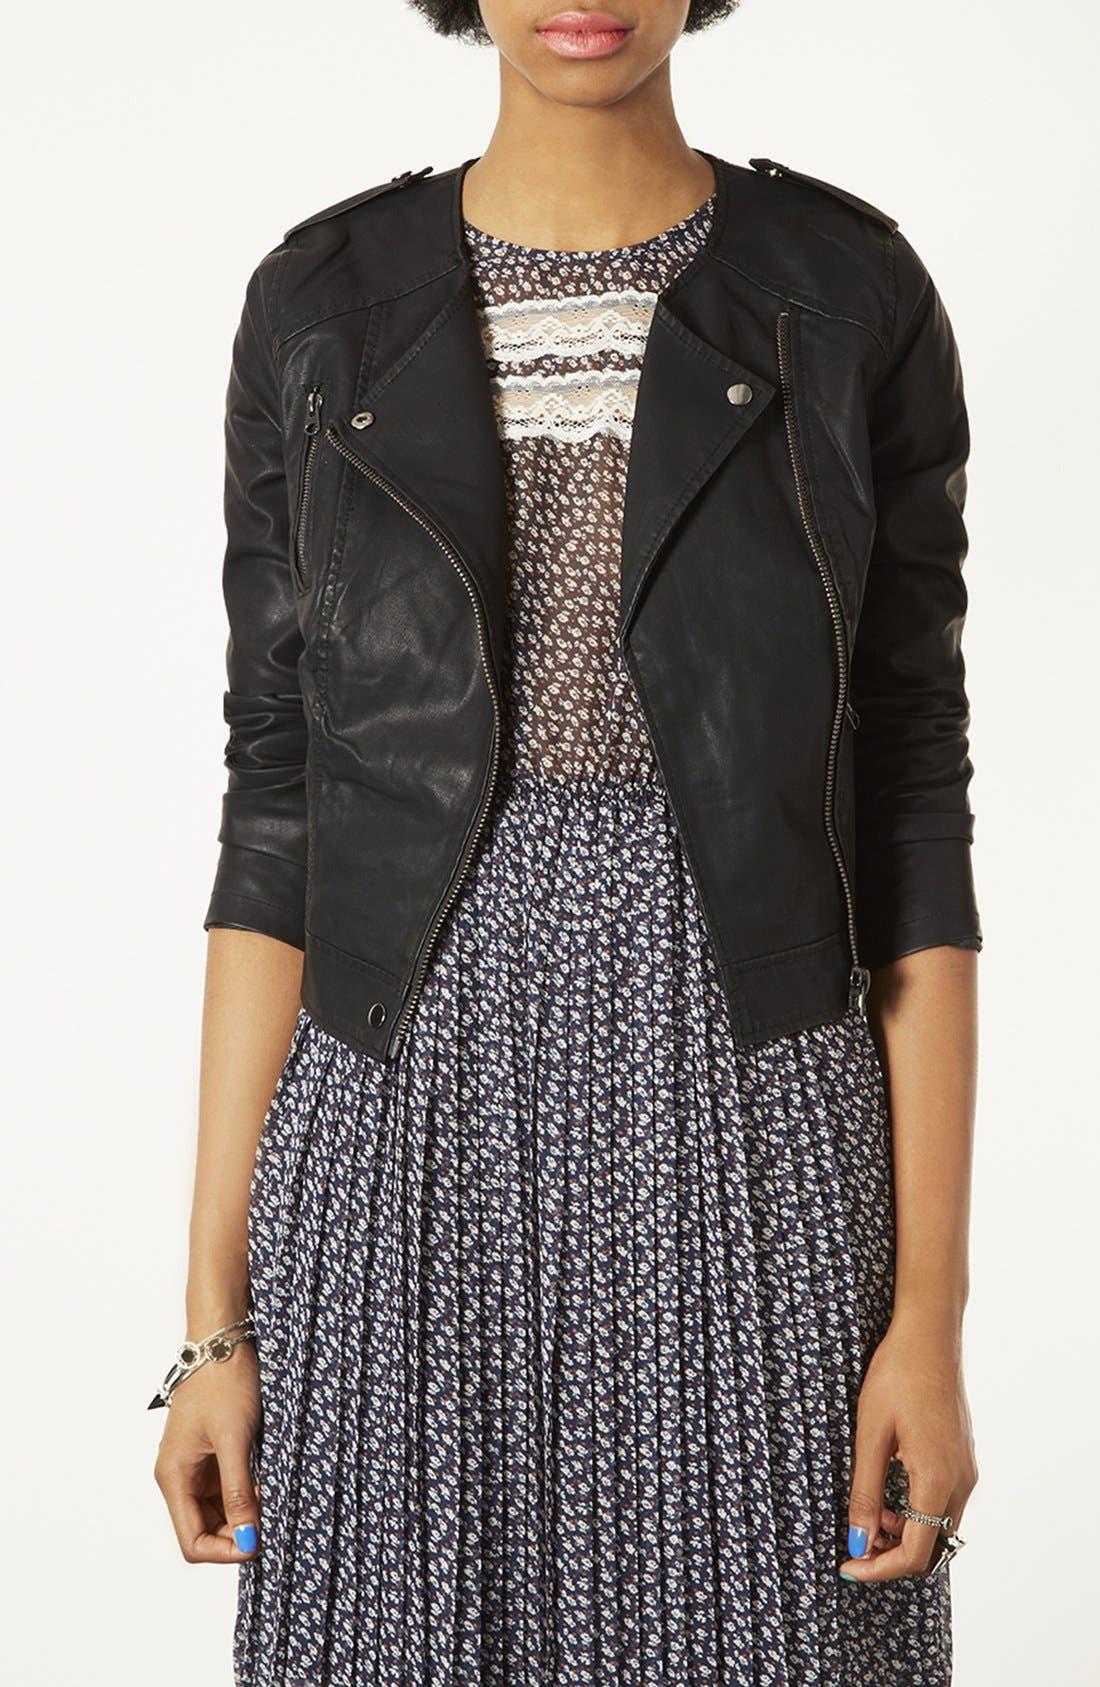 Main Image - Topshop 'Mirabelle' Faux Leather Biker Jacket